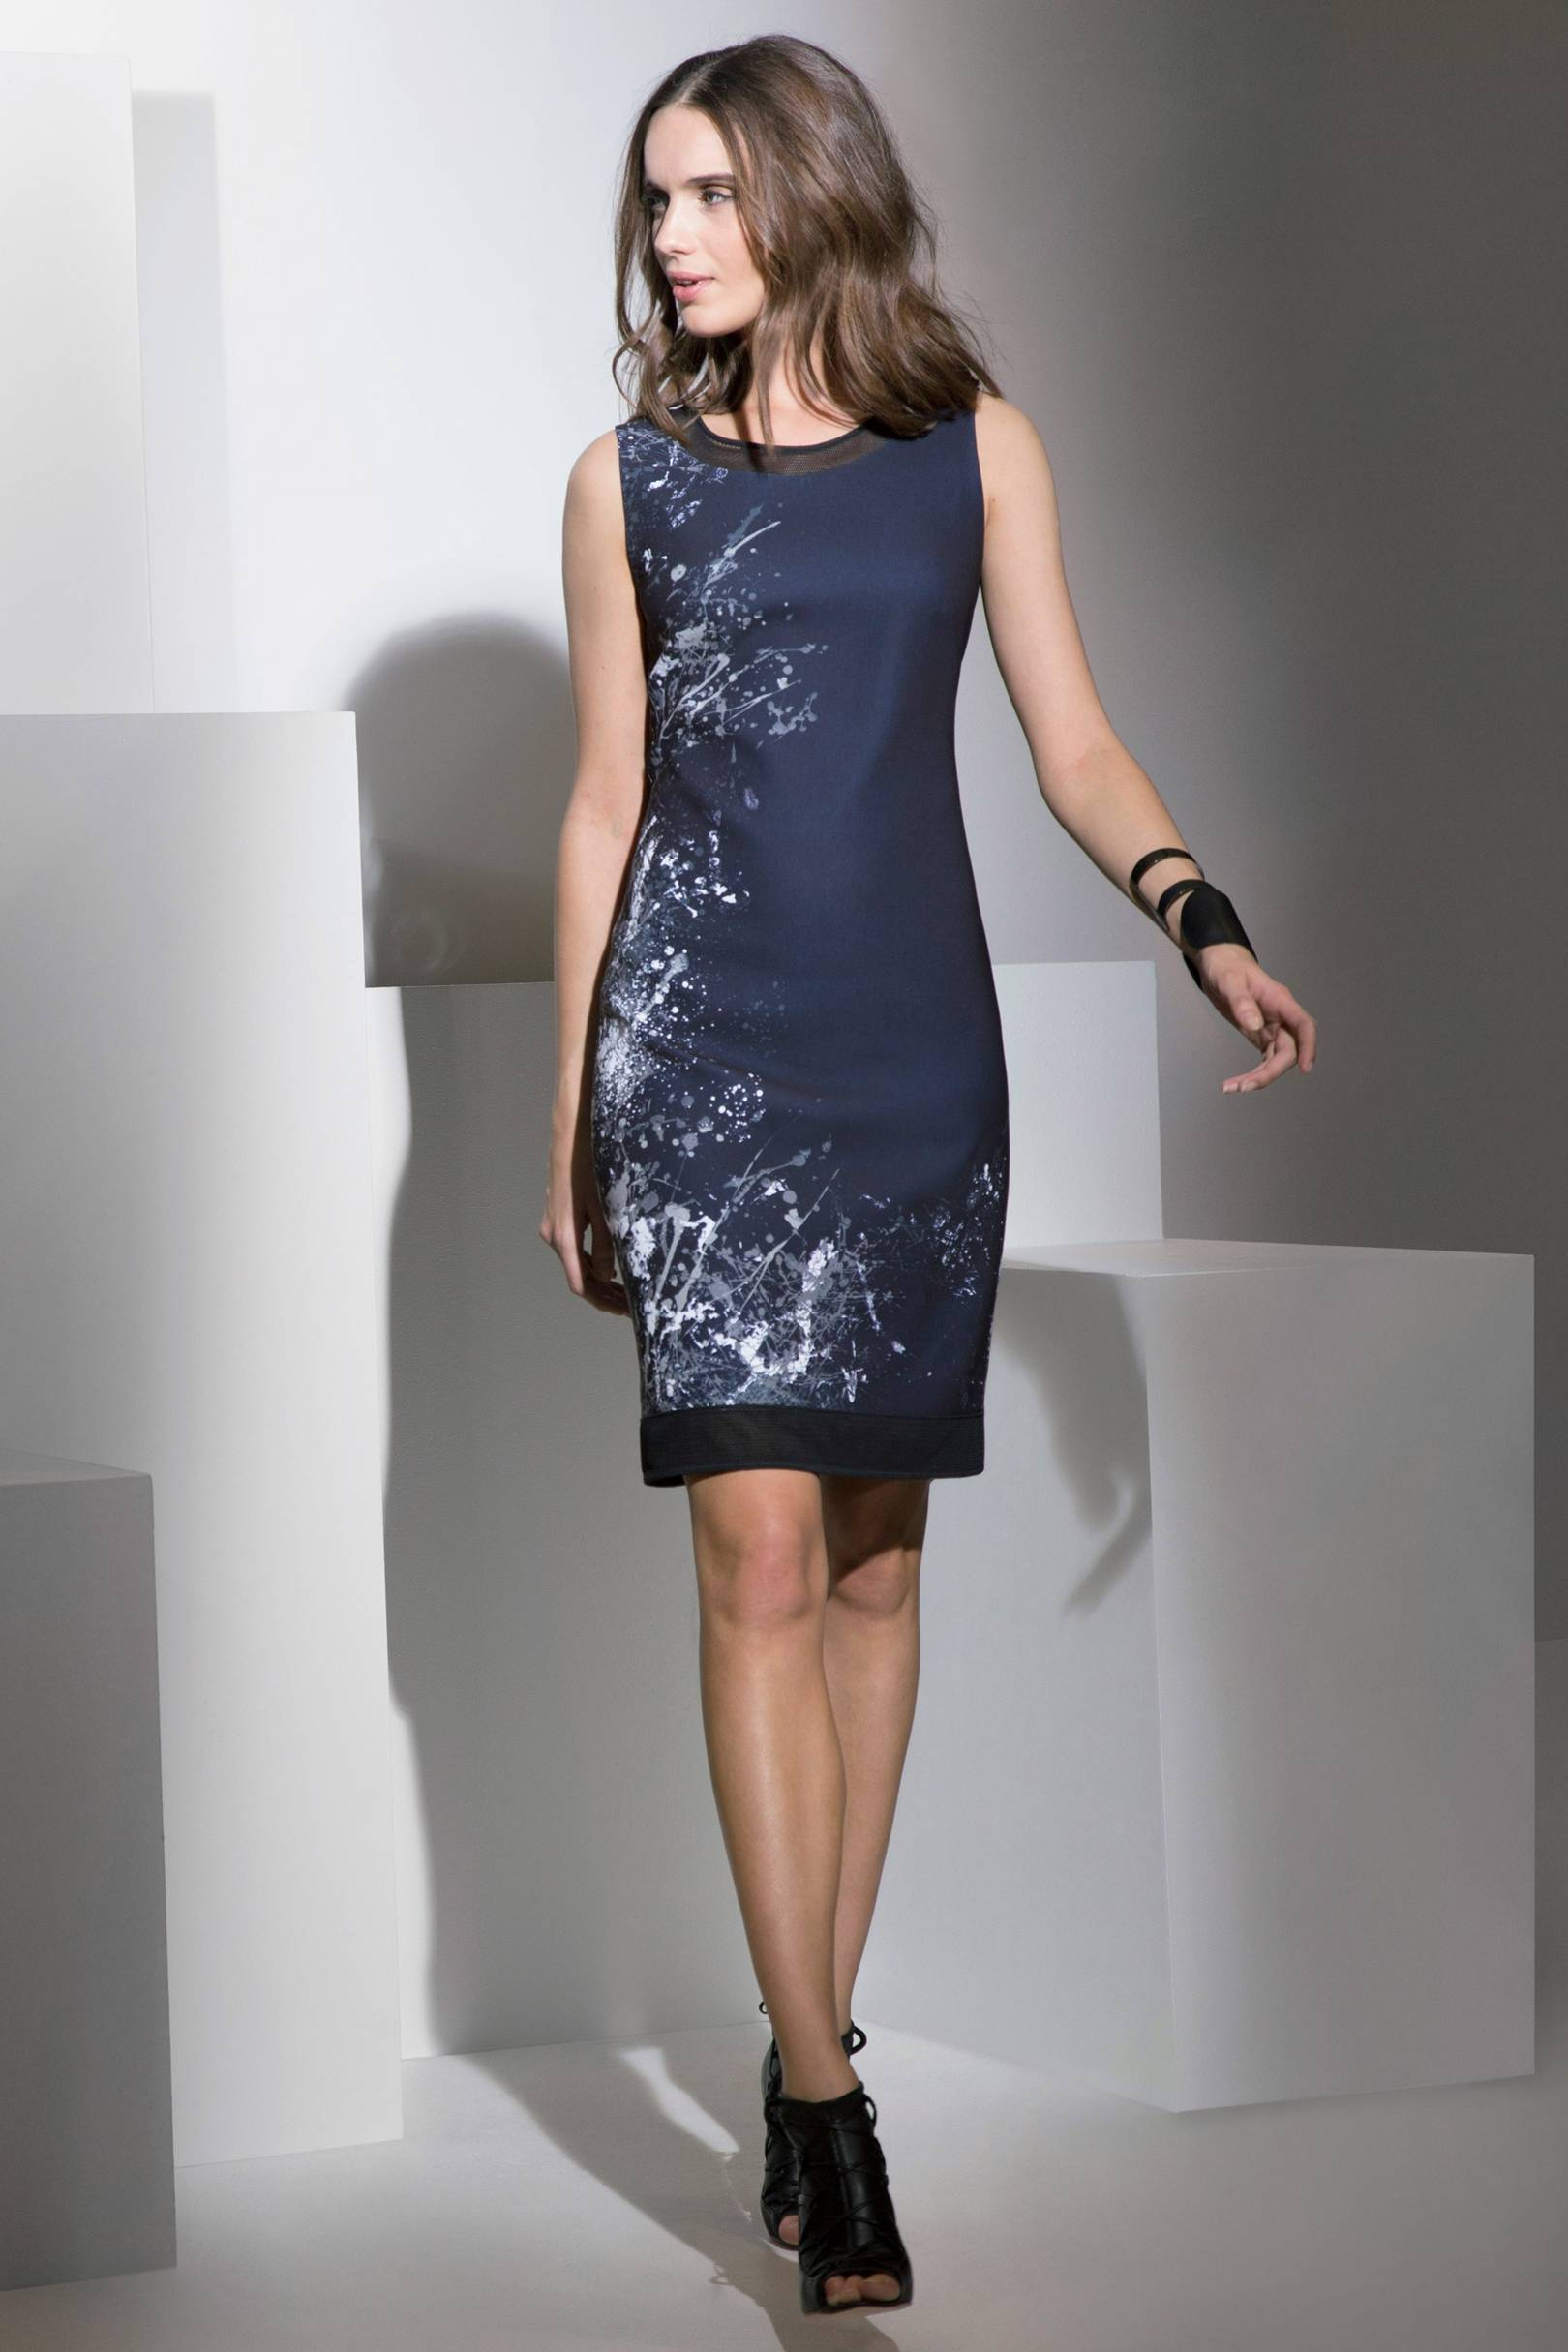 d13159637355 Elie Tahari Autumn/Winter 2014 Pre-Fall   British Vogue